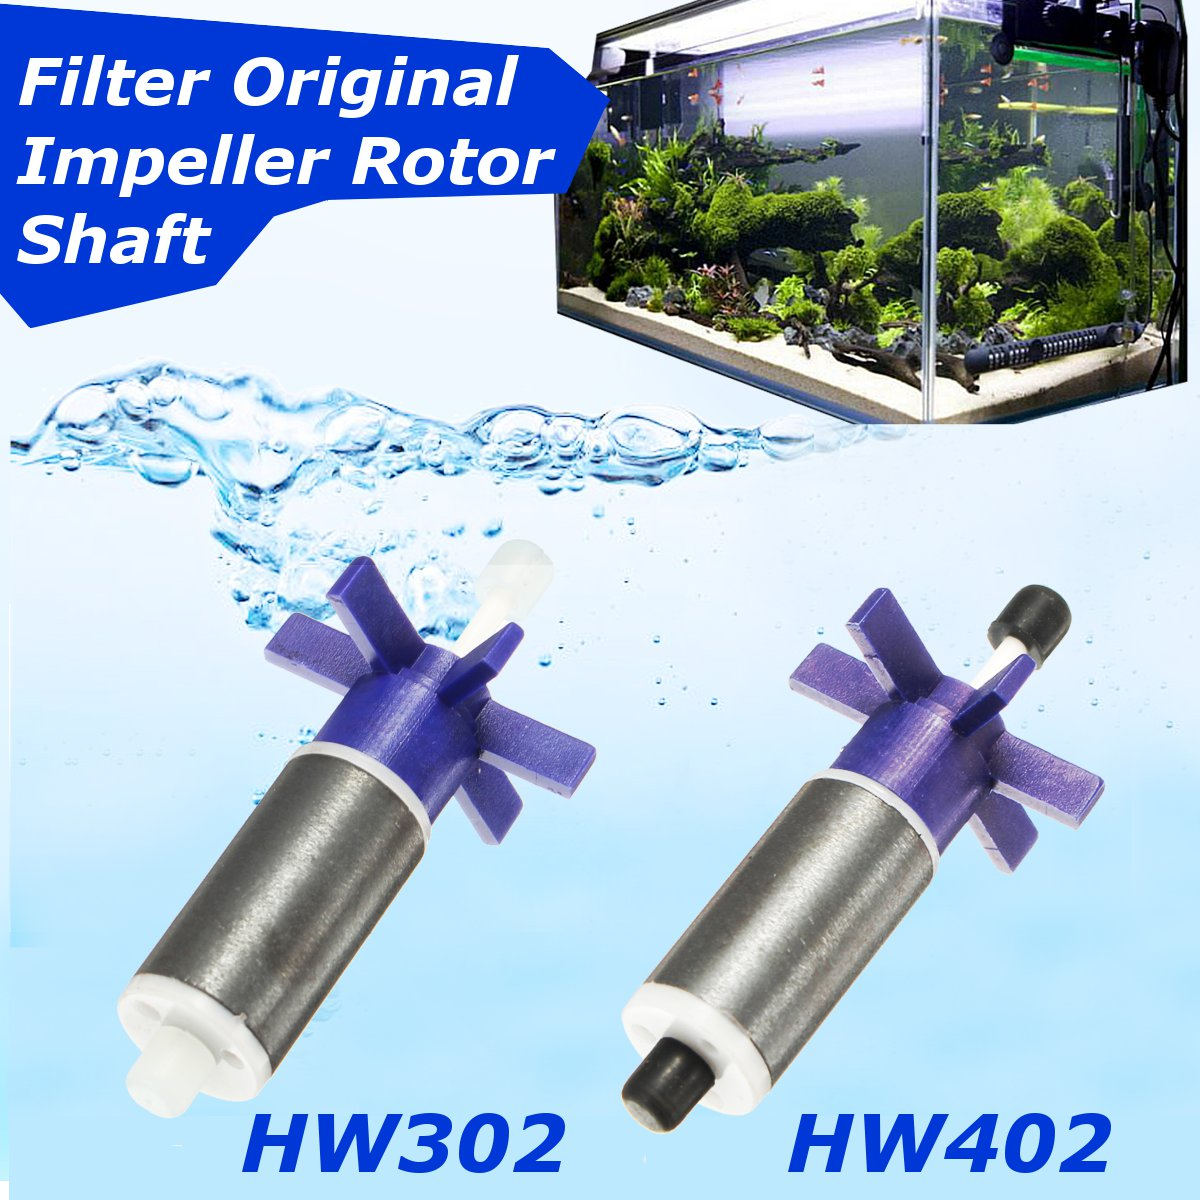 Filters Accessories HW302 HW402 Canister Filter Impeller Rotor Shaft For Sunsun 68x33mm Filter Vat Water Pump Impeller